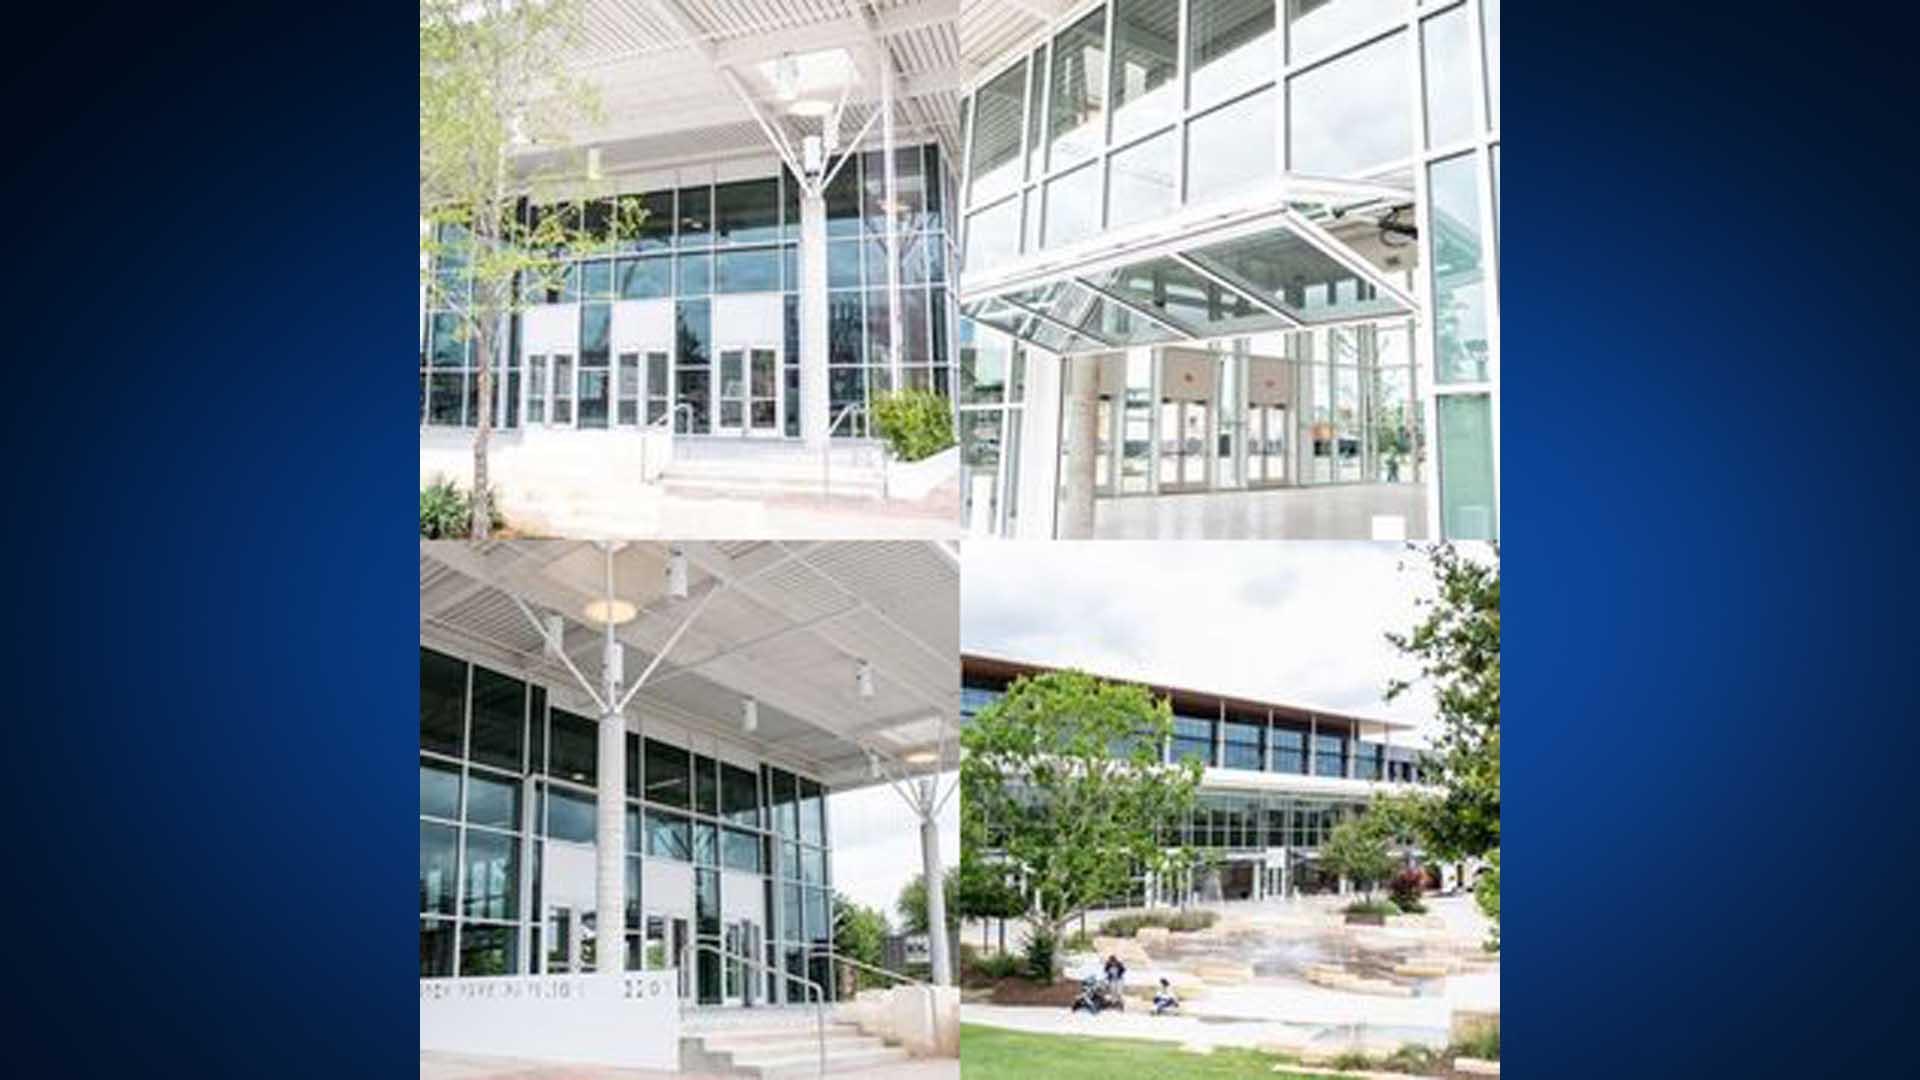 New Pavilion at Mary Elizabeth Branch Park (Texas Farmers' Market Photo)